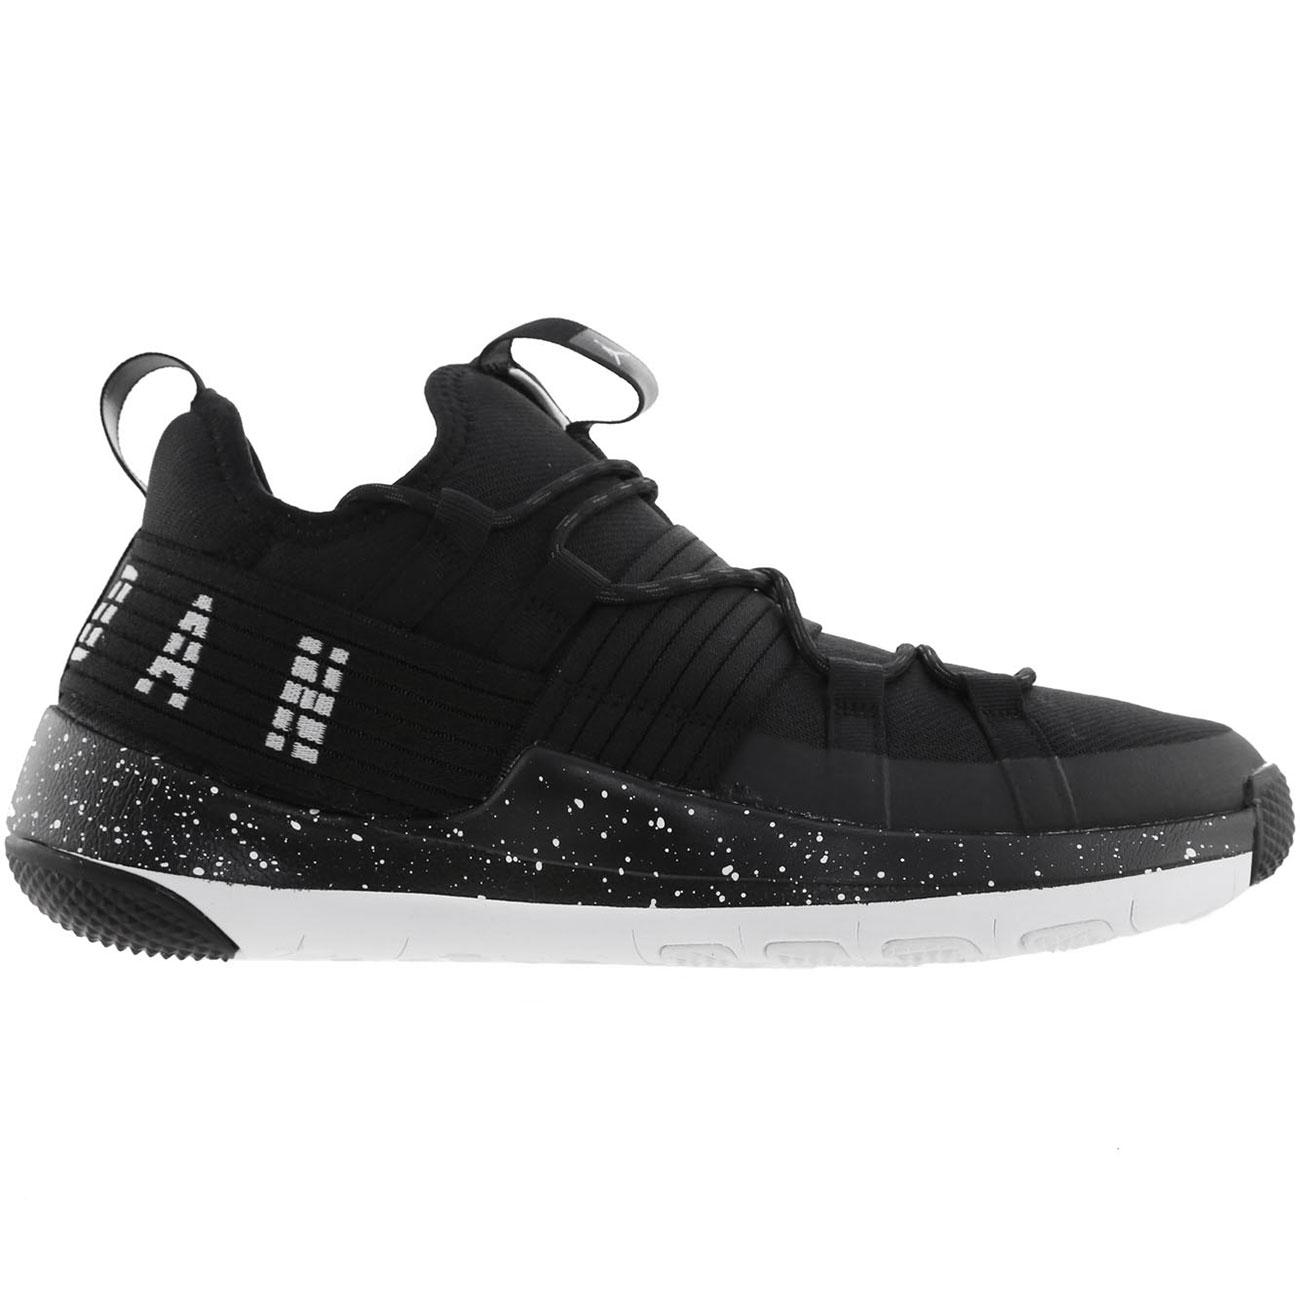 b53cd8025a81cd Jordan Trainer Pro Herren Basketballschuhe schwarz weiß AA1344 010